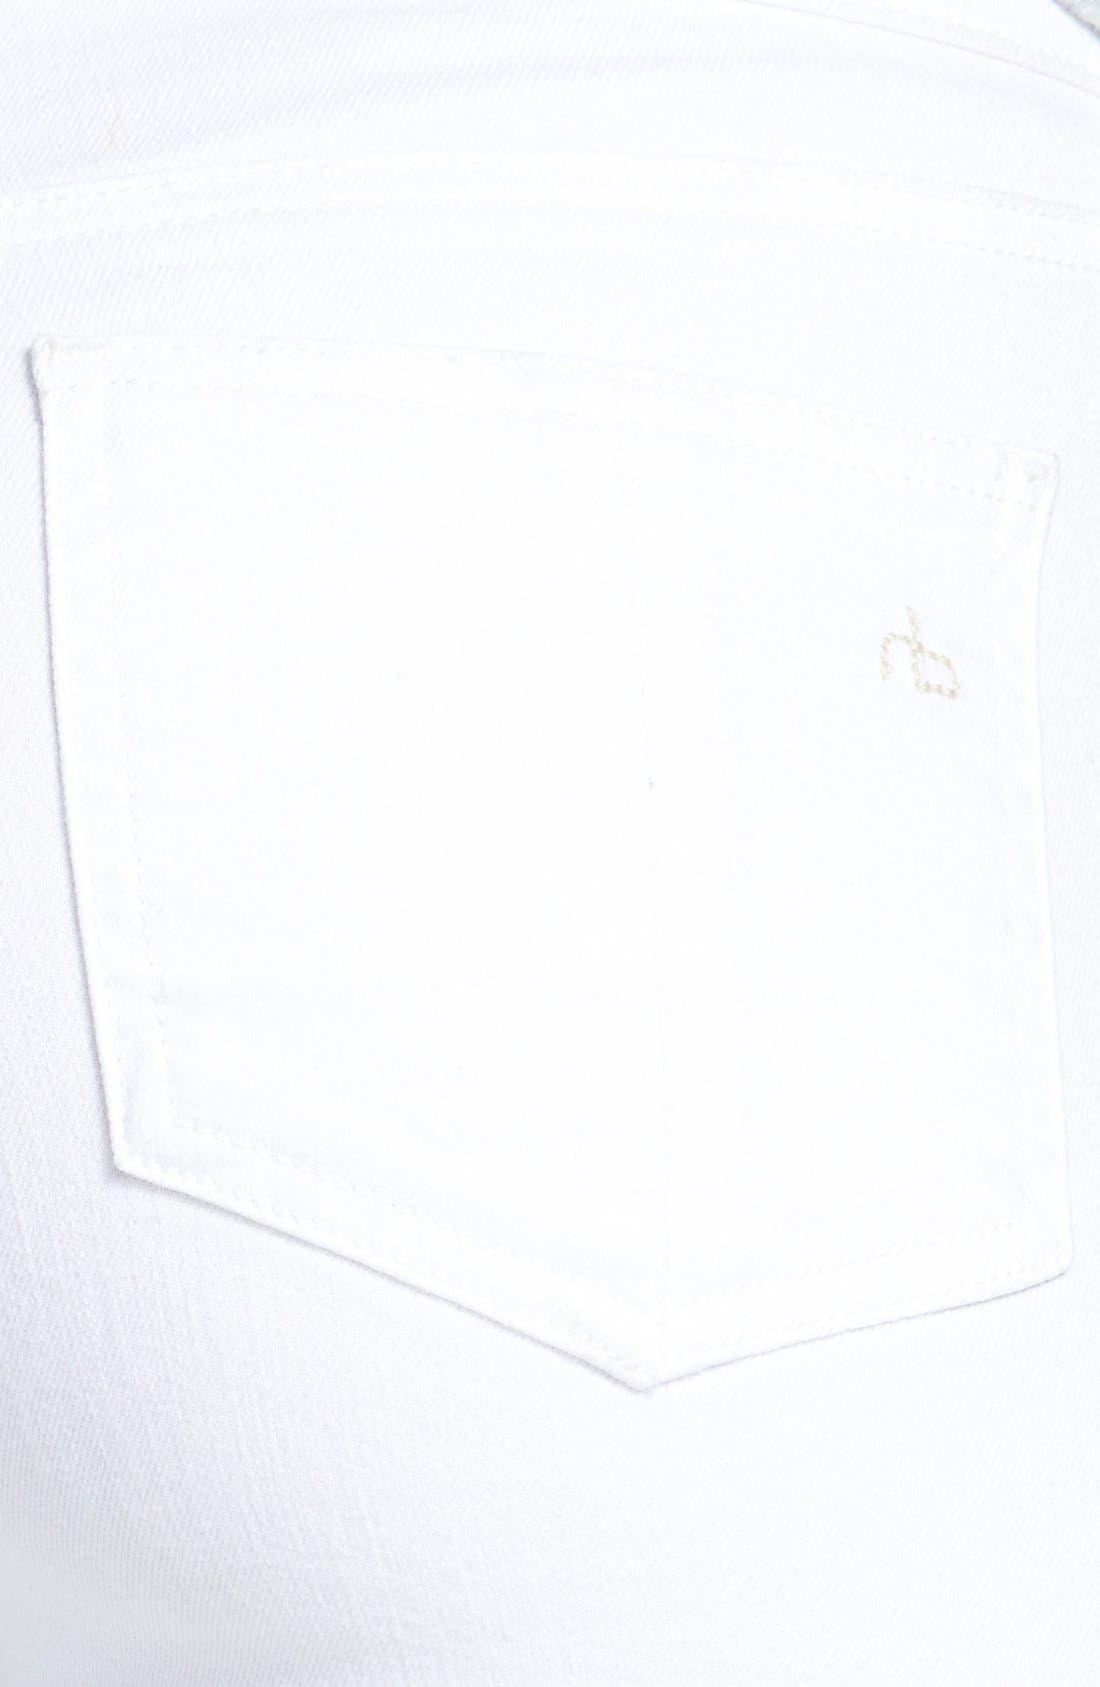 Alternate Image 3  - rag & bone/JEAN 'The Skinny' Crop Jeans (Bright White)